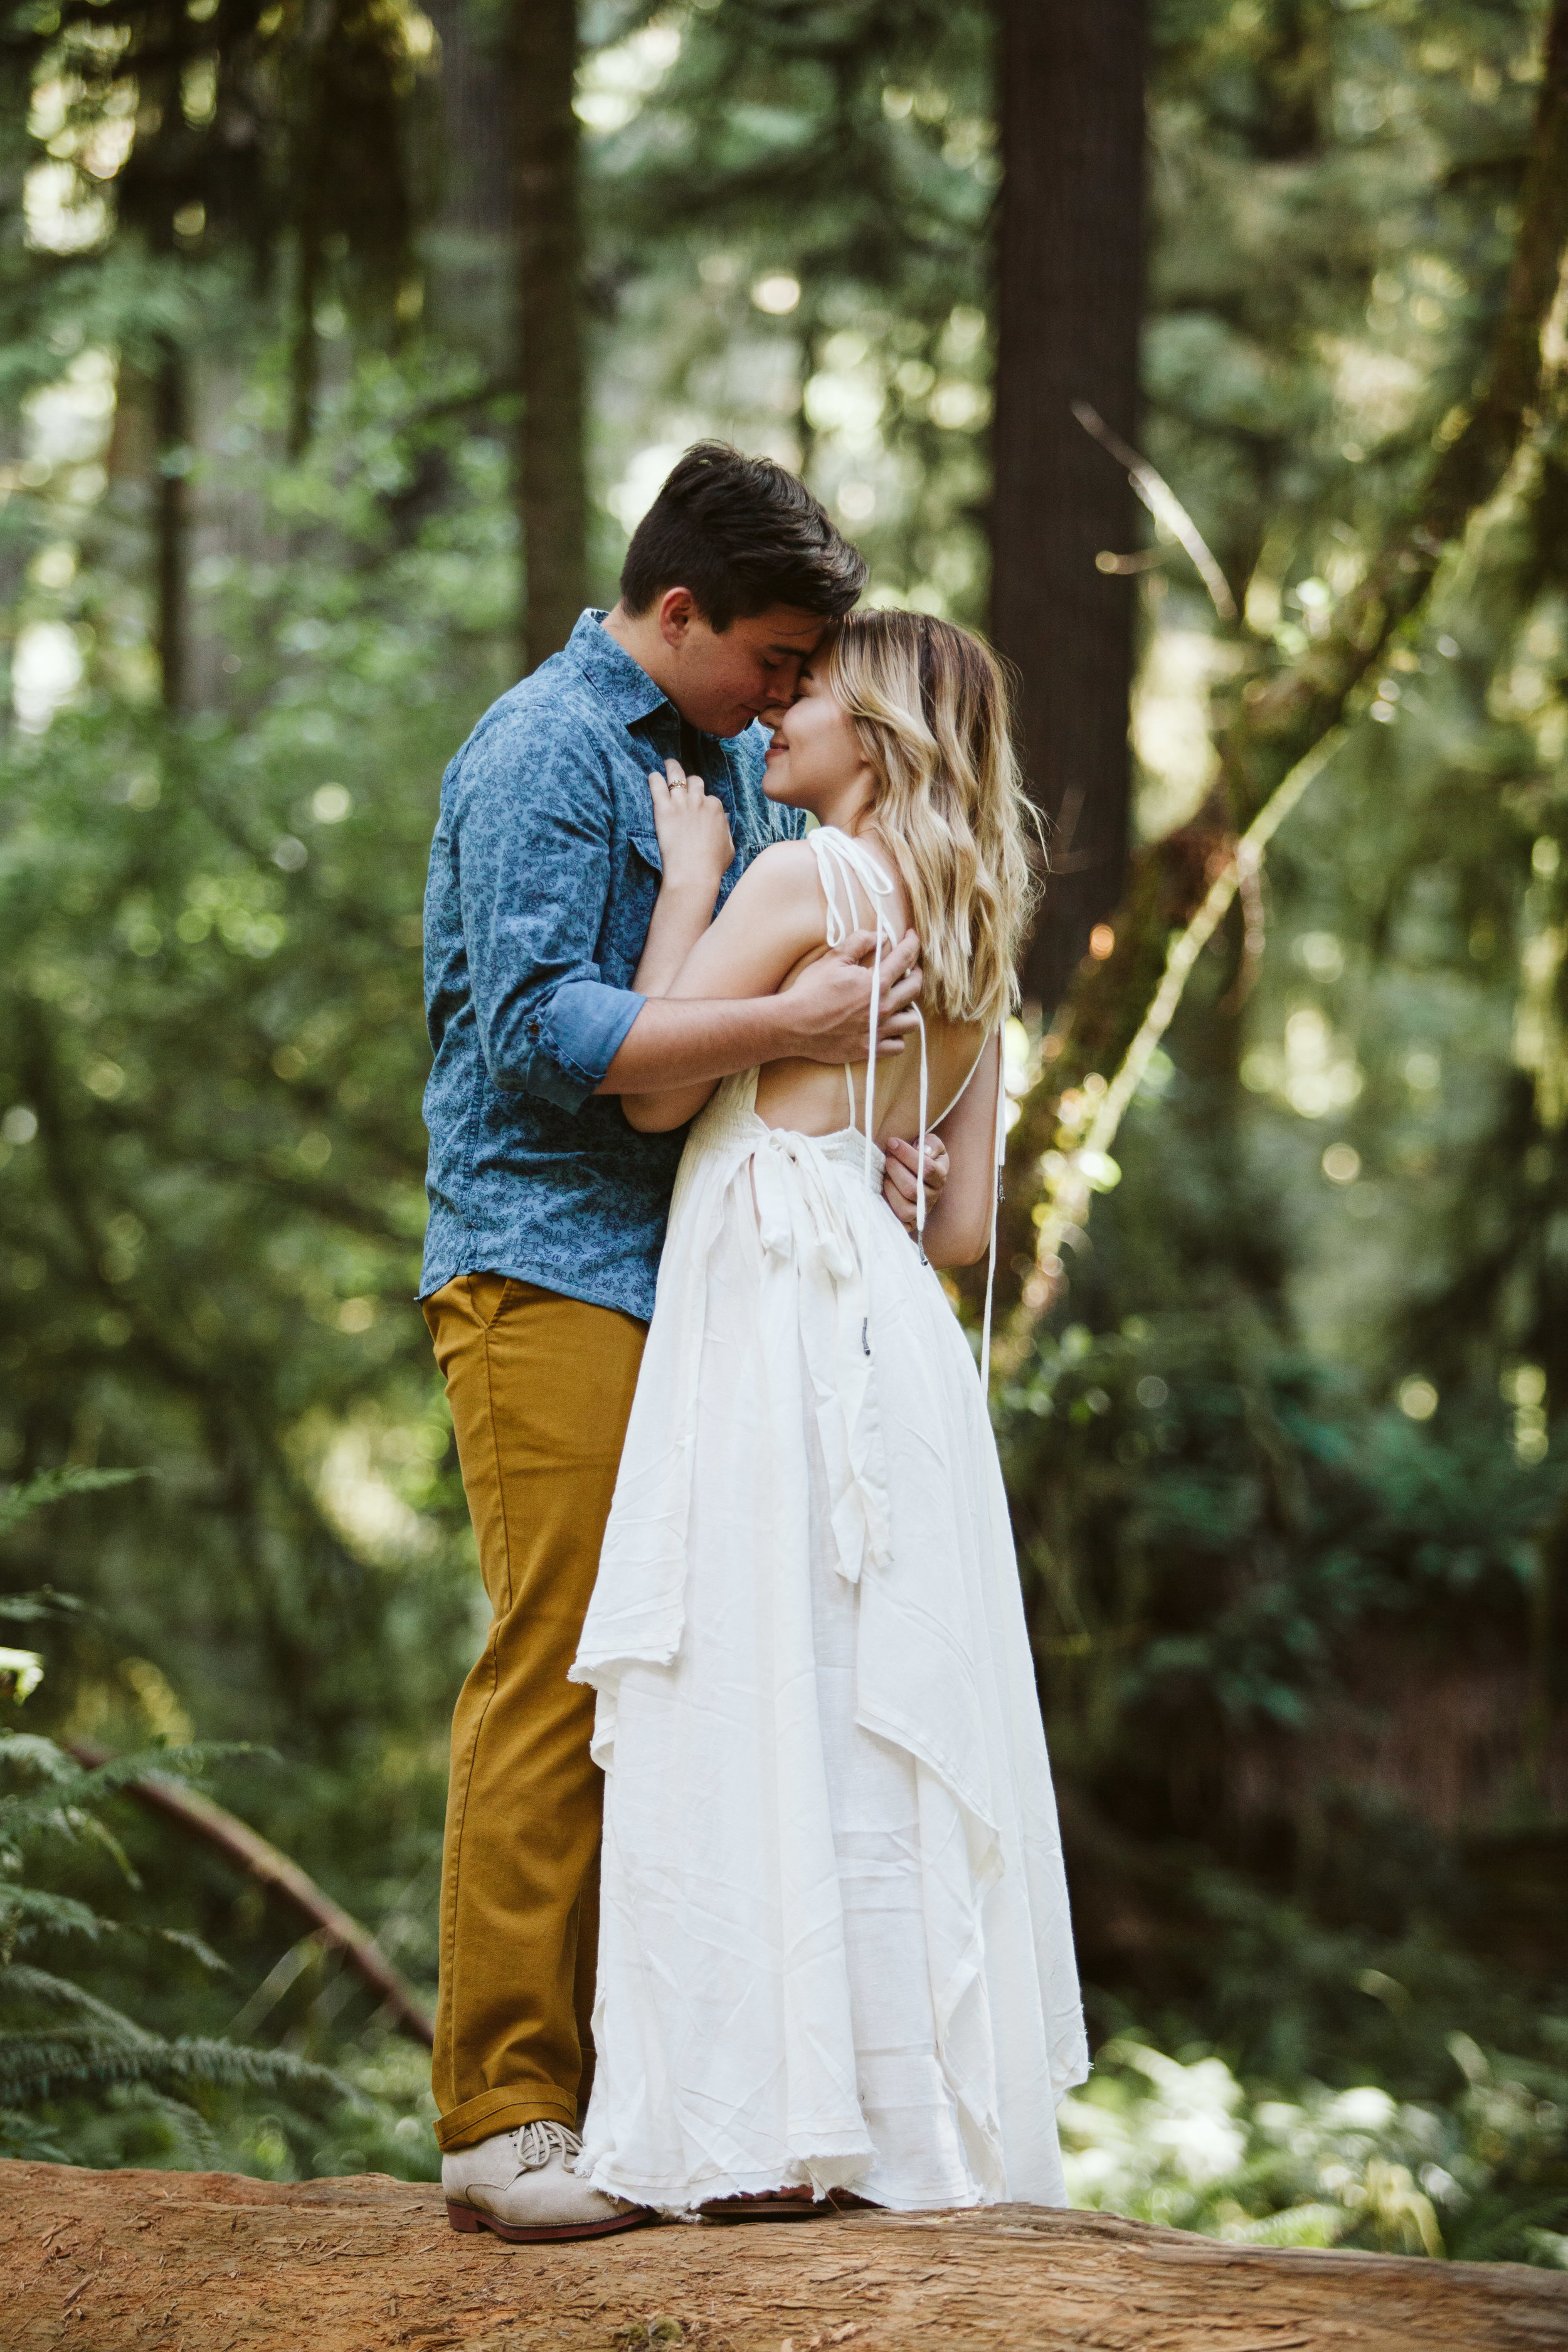 Hannah&Ben_Redwoods_Elopement_Engagement_PNW_SouthernOregon_NorthernCalifornia_ (7 of 23).jpg